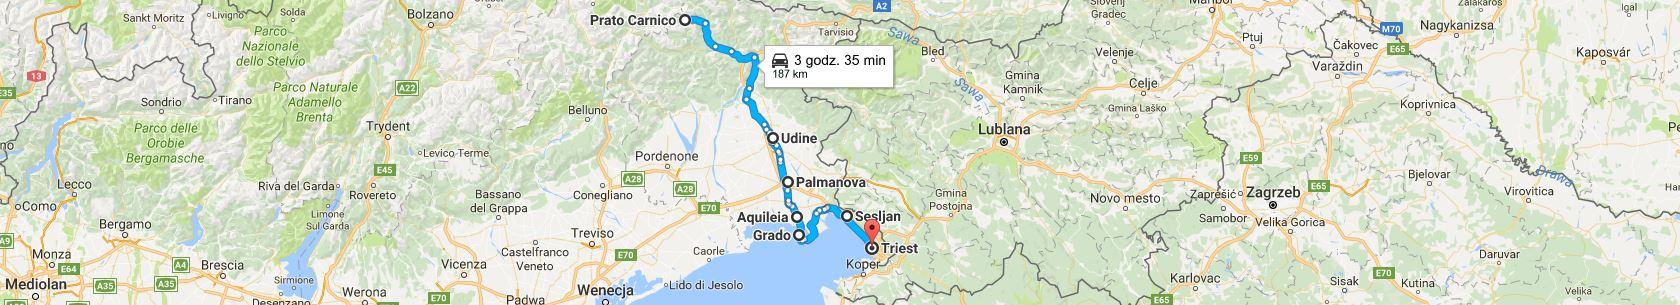 Trasa z Prato Carnico do Triestu